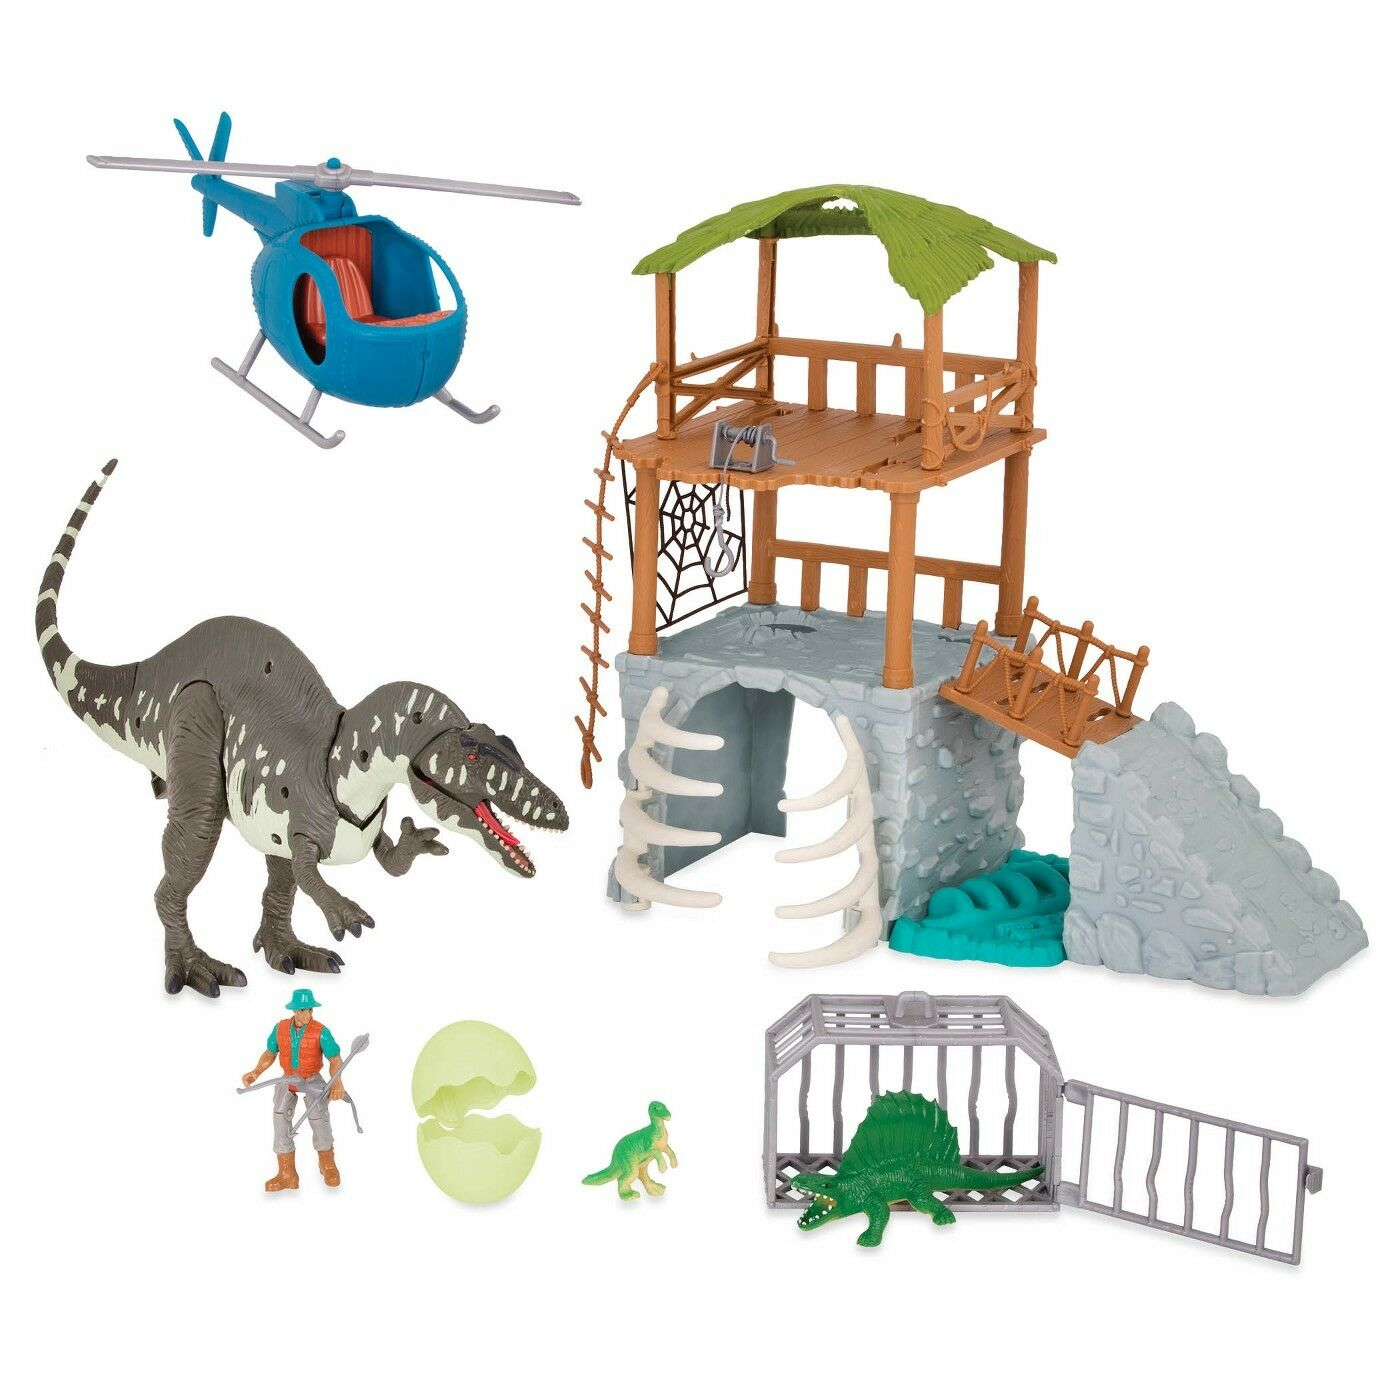 TERRA Jungle Expedition Dino Electronic Dino Playset Light Sound NEW DAMAGED BOX